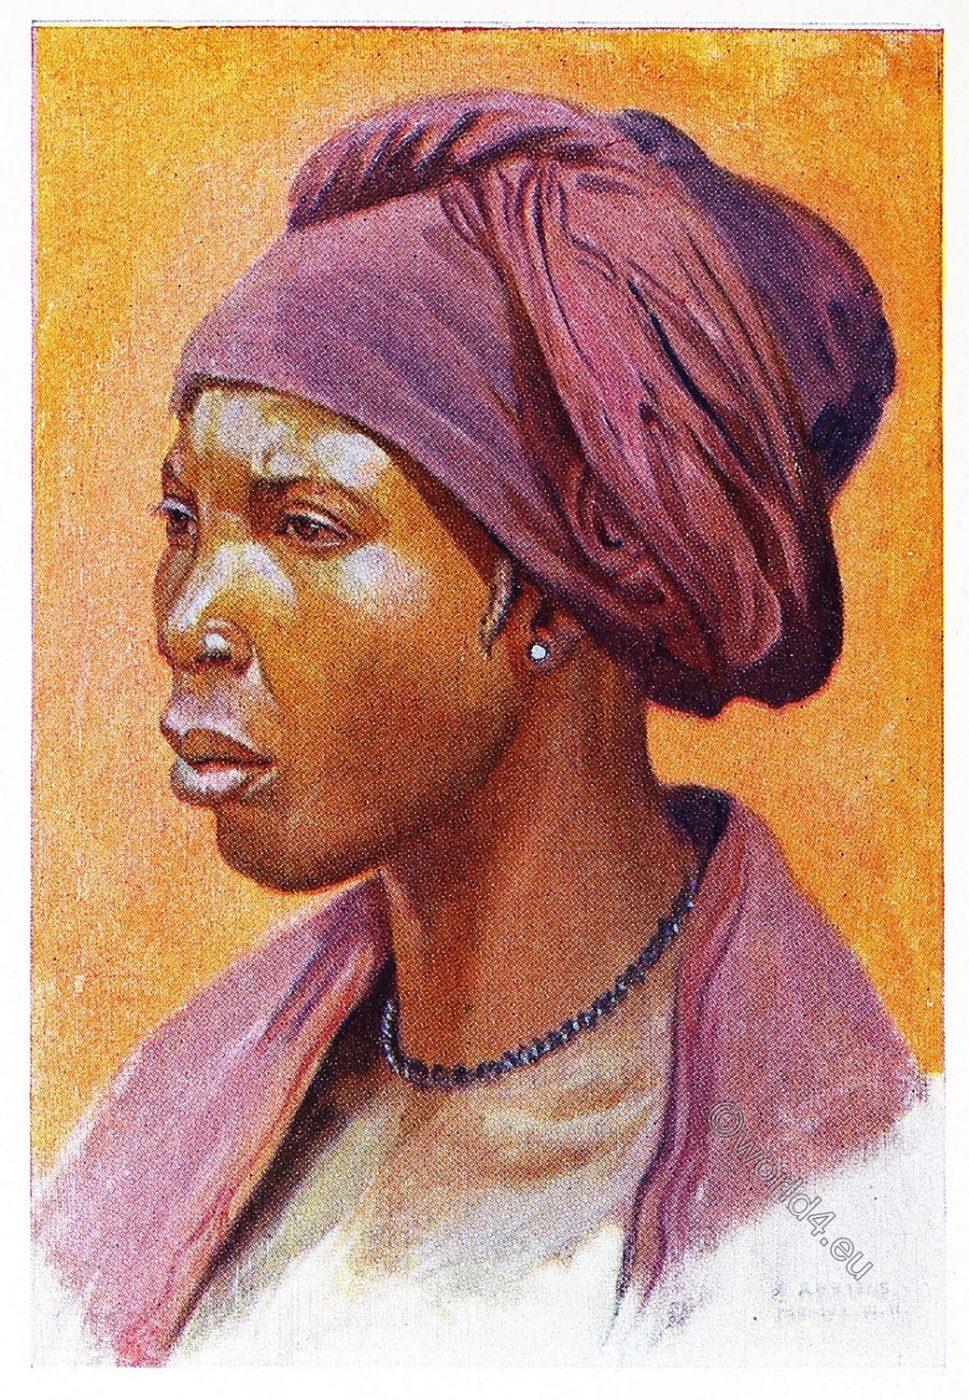 Nupe, Woman, Africa, costume, Leo Frobenius, clothing, Sudan